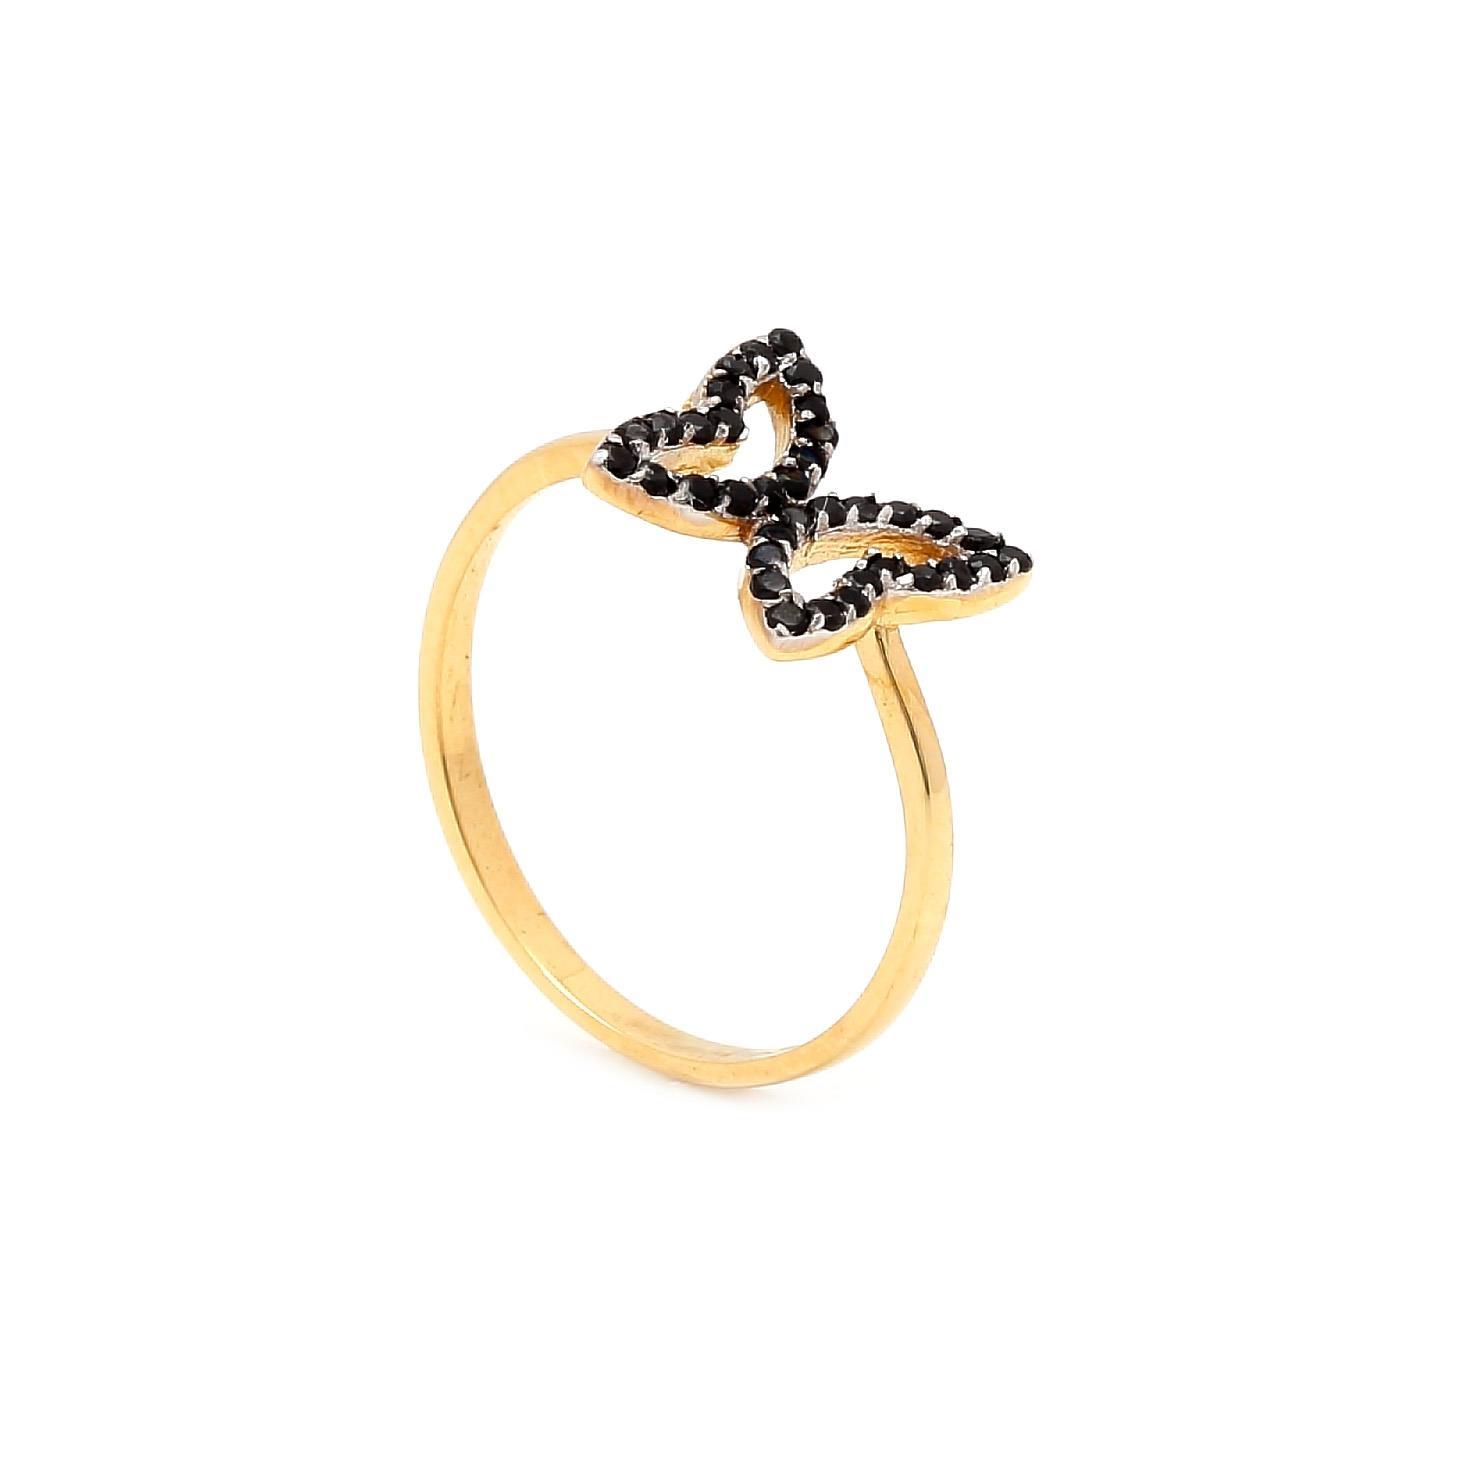 Zlatý prsteň MOTÝĽ s čiernymi kamienkami